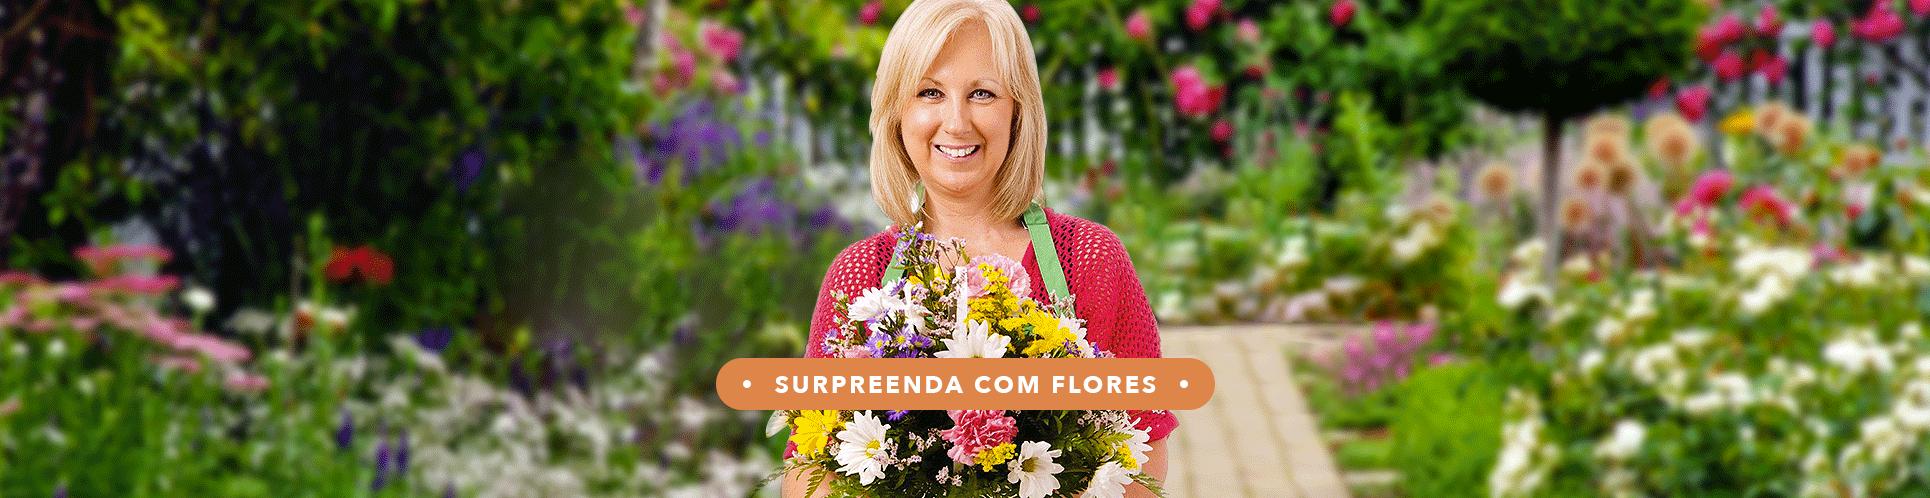 Surpreenda com flores